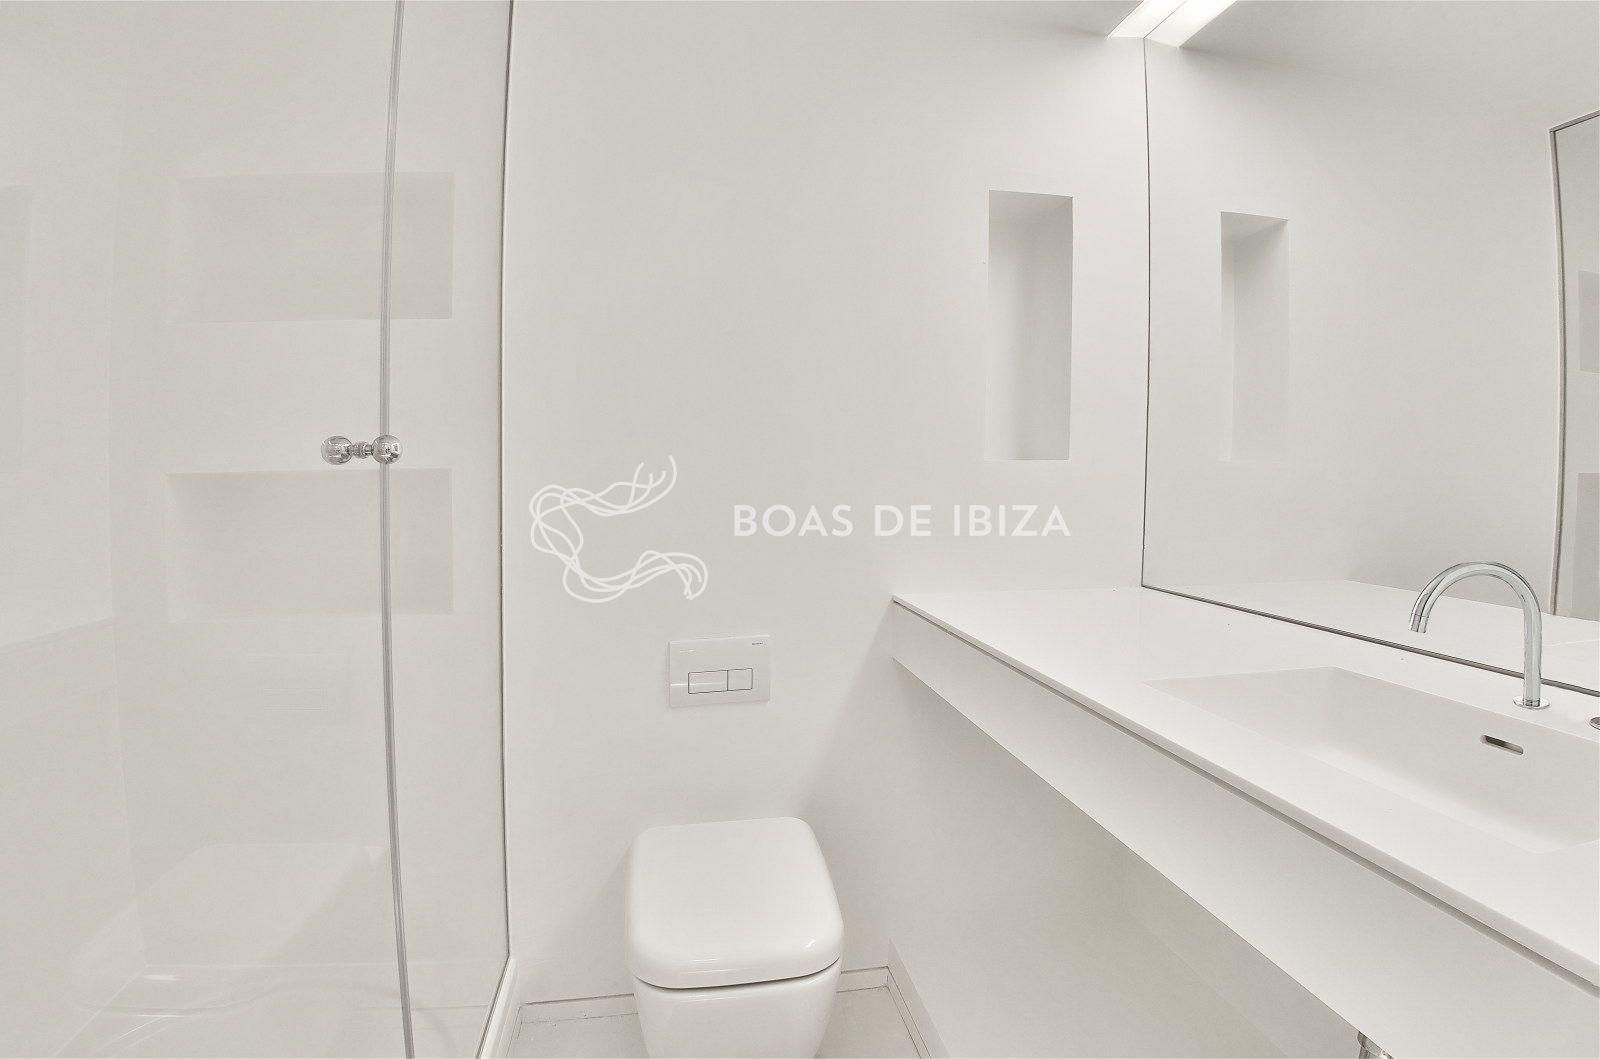 Boas JPG-mini_13